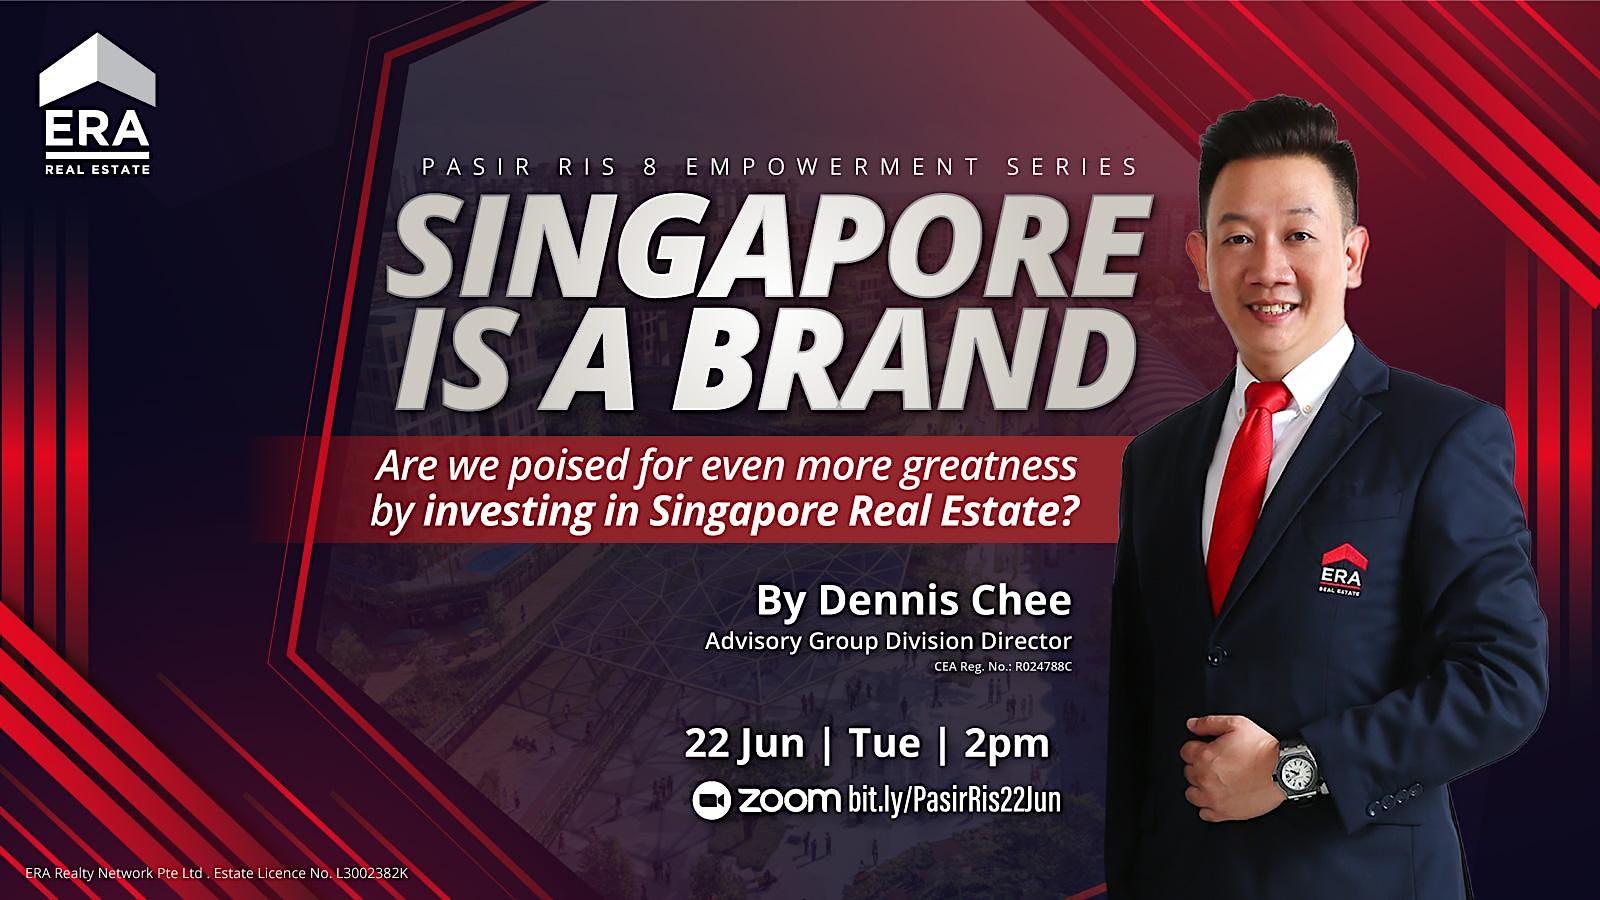 Singapore Is A Brand (Pasir Ris 8 Empowerment)